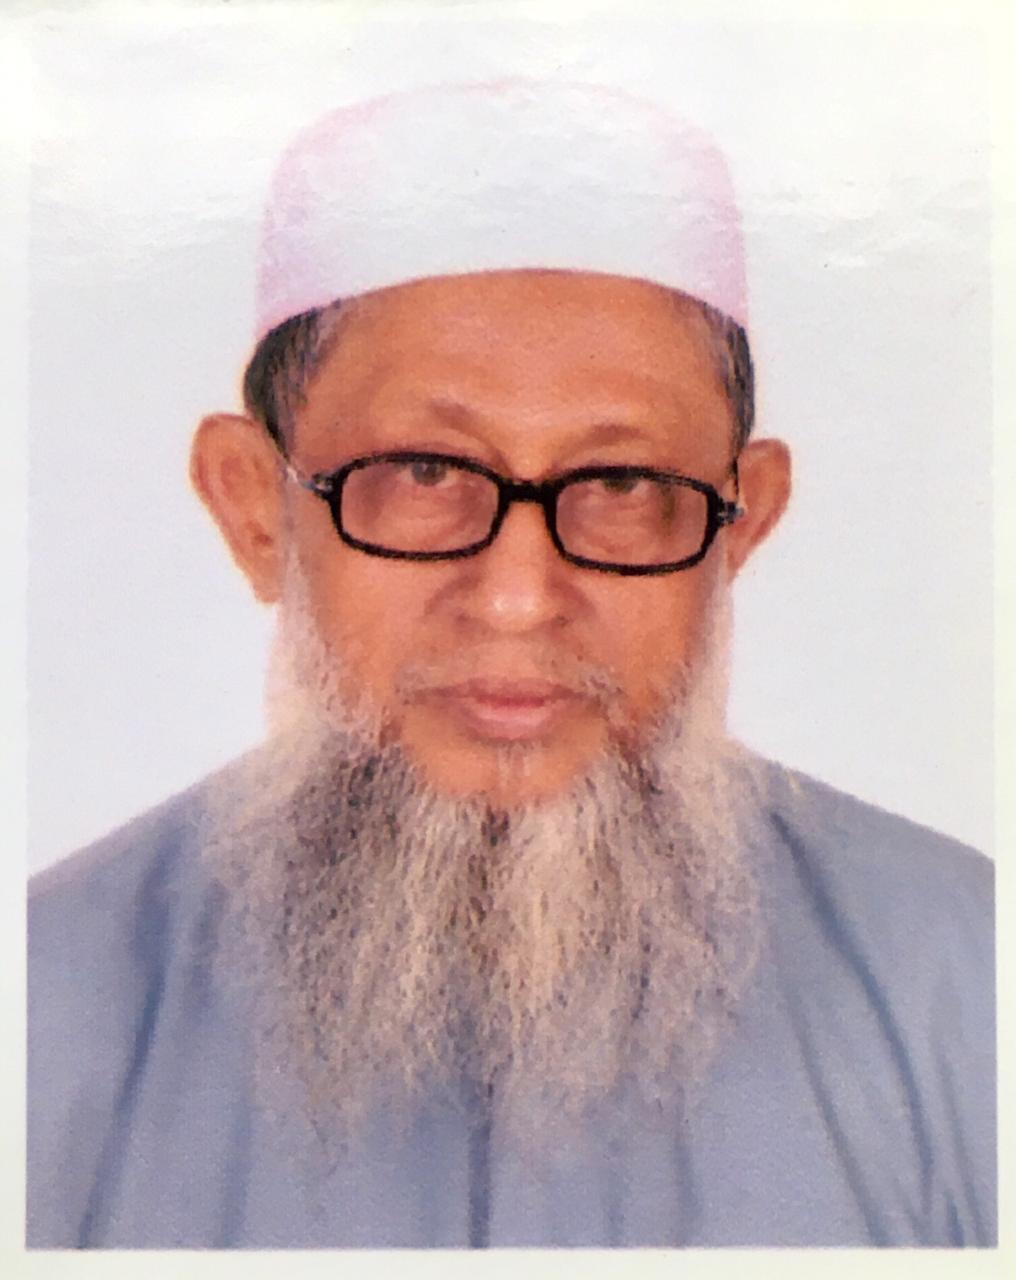 https://aznaltd.com/wp-content/uploads/2019/05/Engr.-Shahidul-Islam-CTC.jpeg